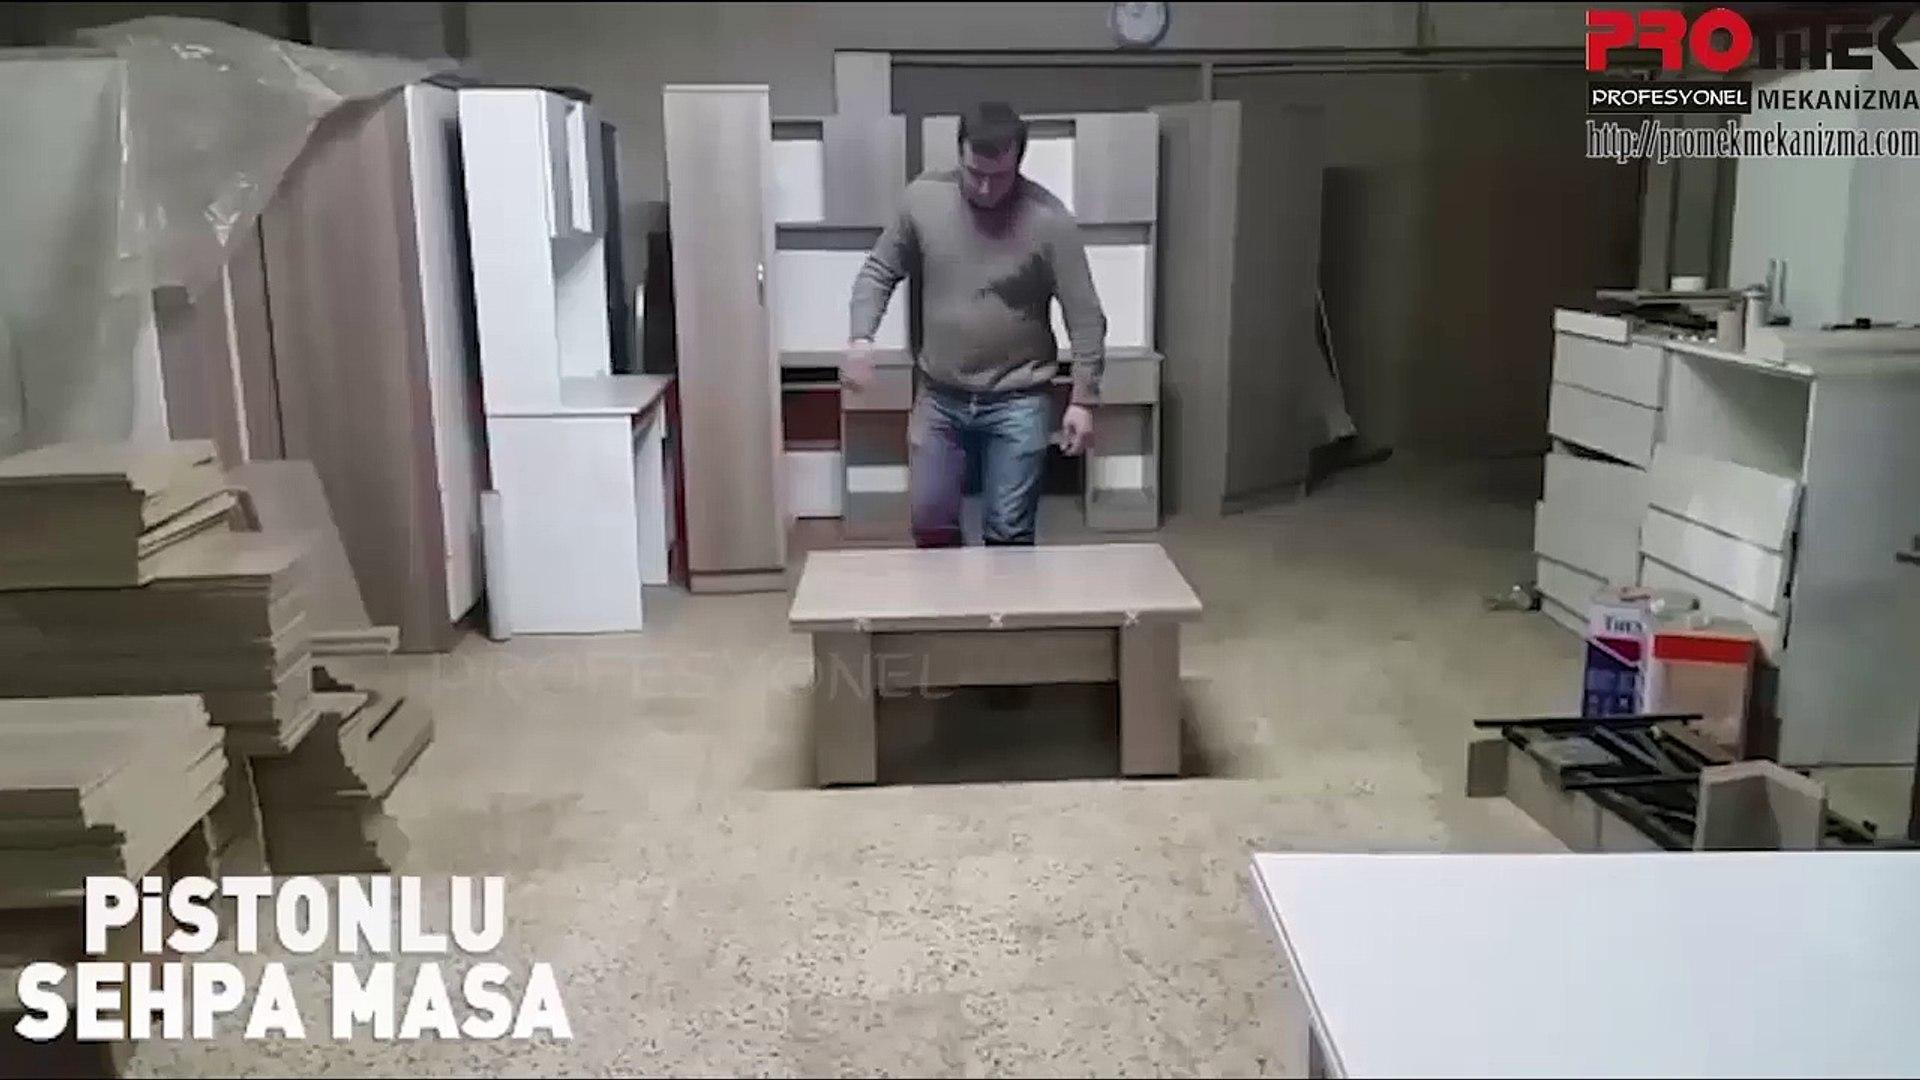 Pistonlu Sehpa Sehpa Mekanizmasi